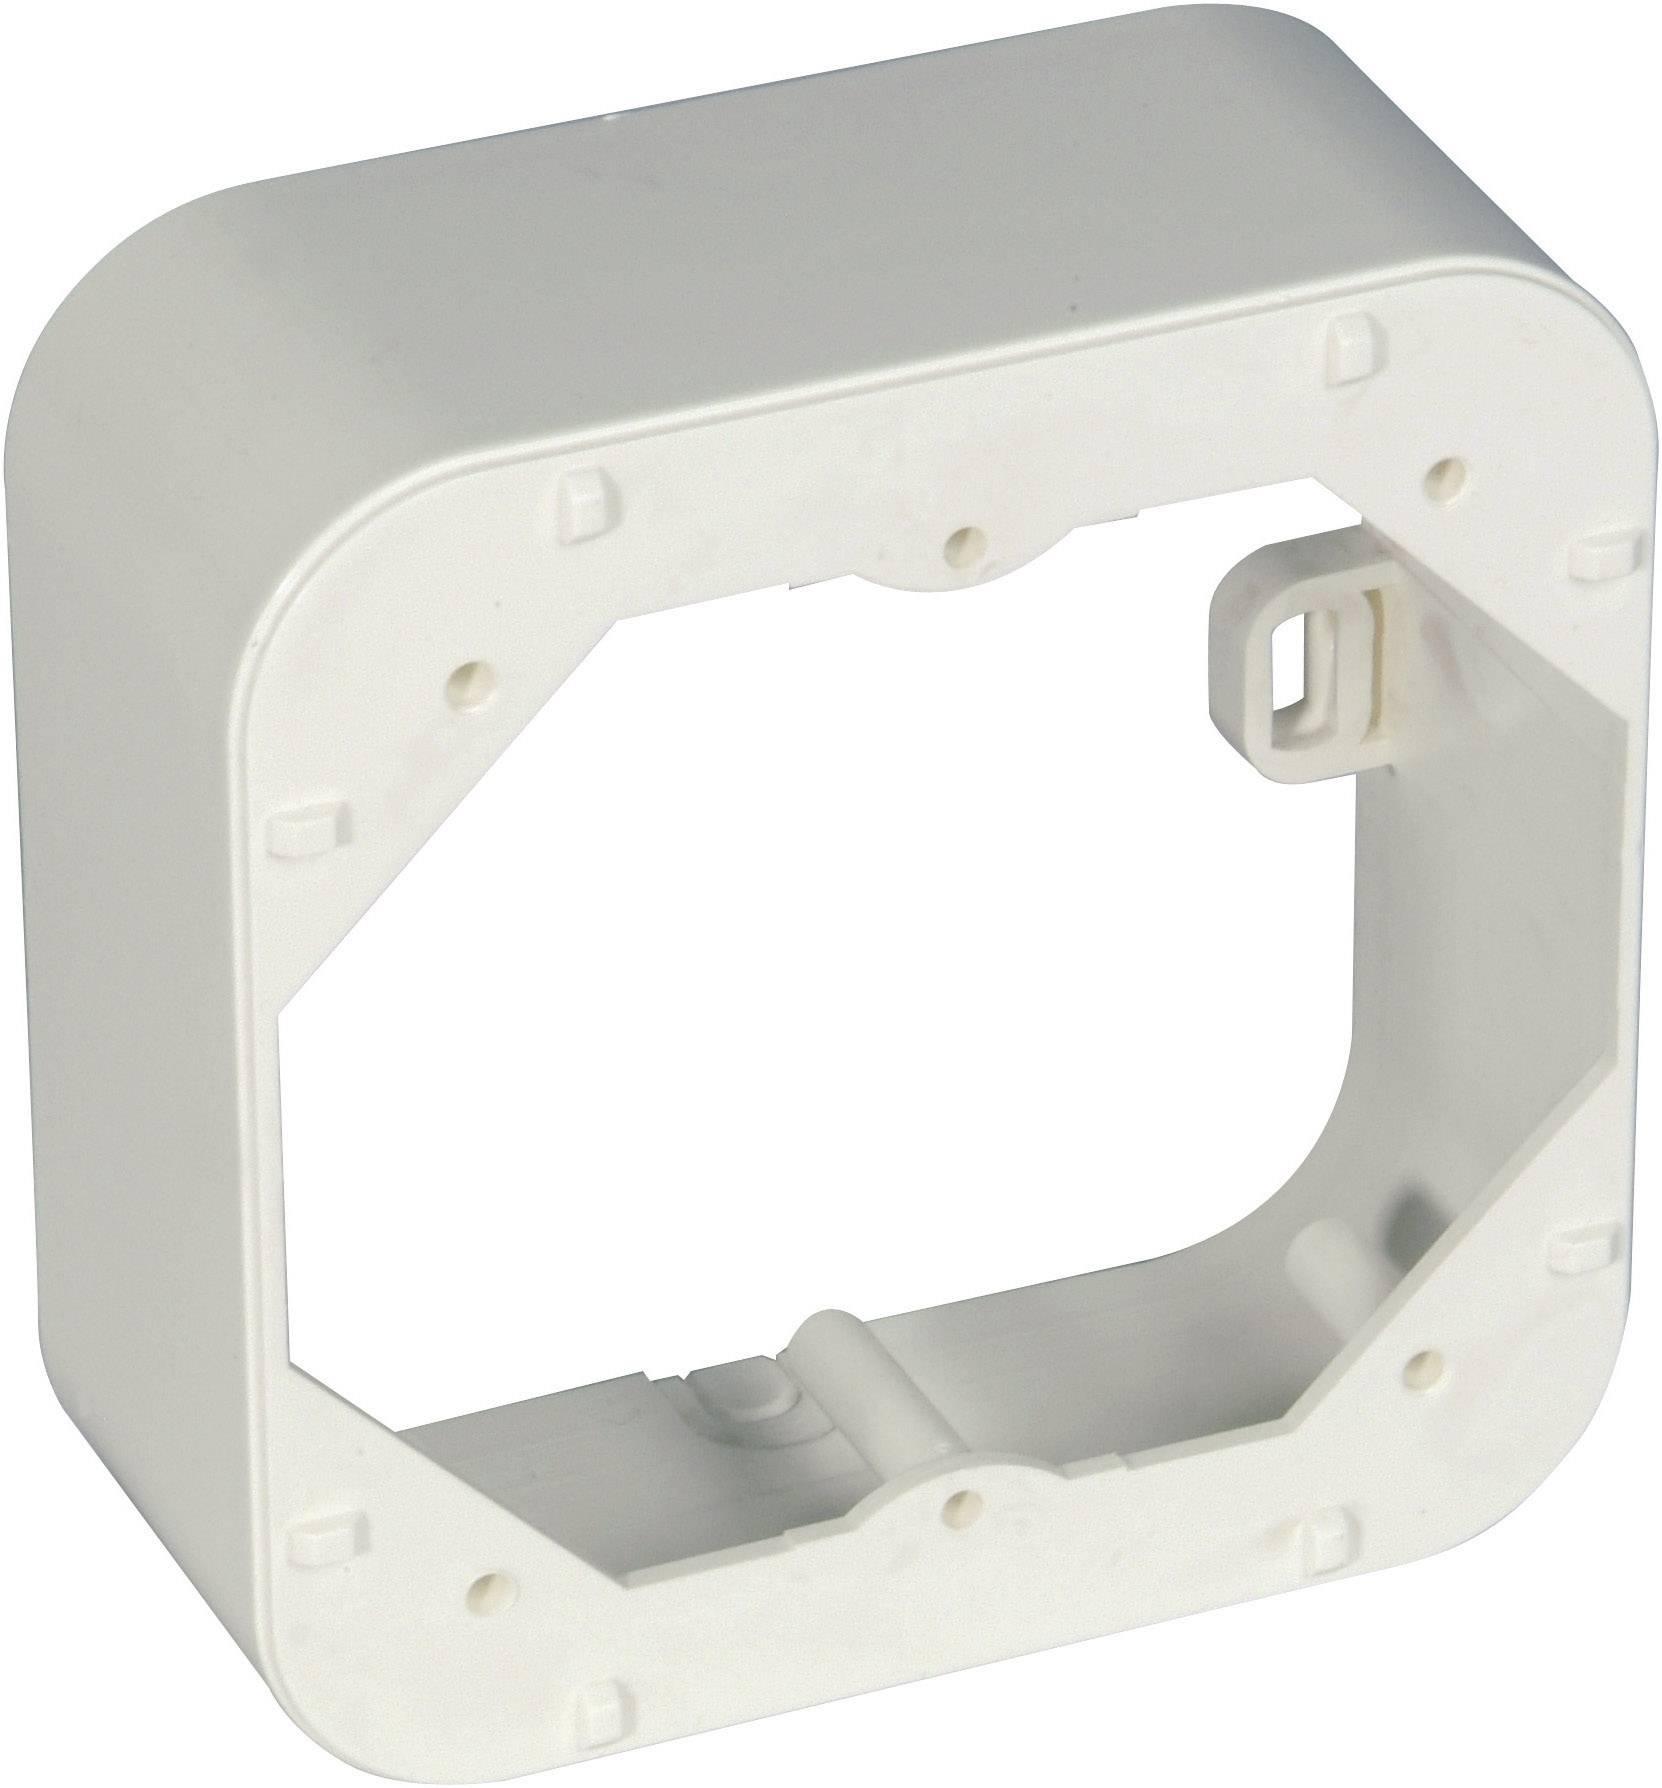 Jednoduchý rámček na omietku Ehmann Rollo